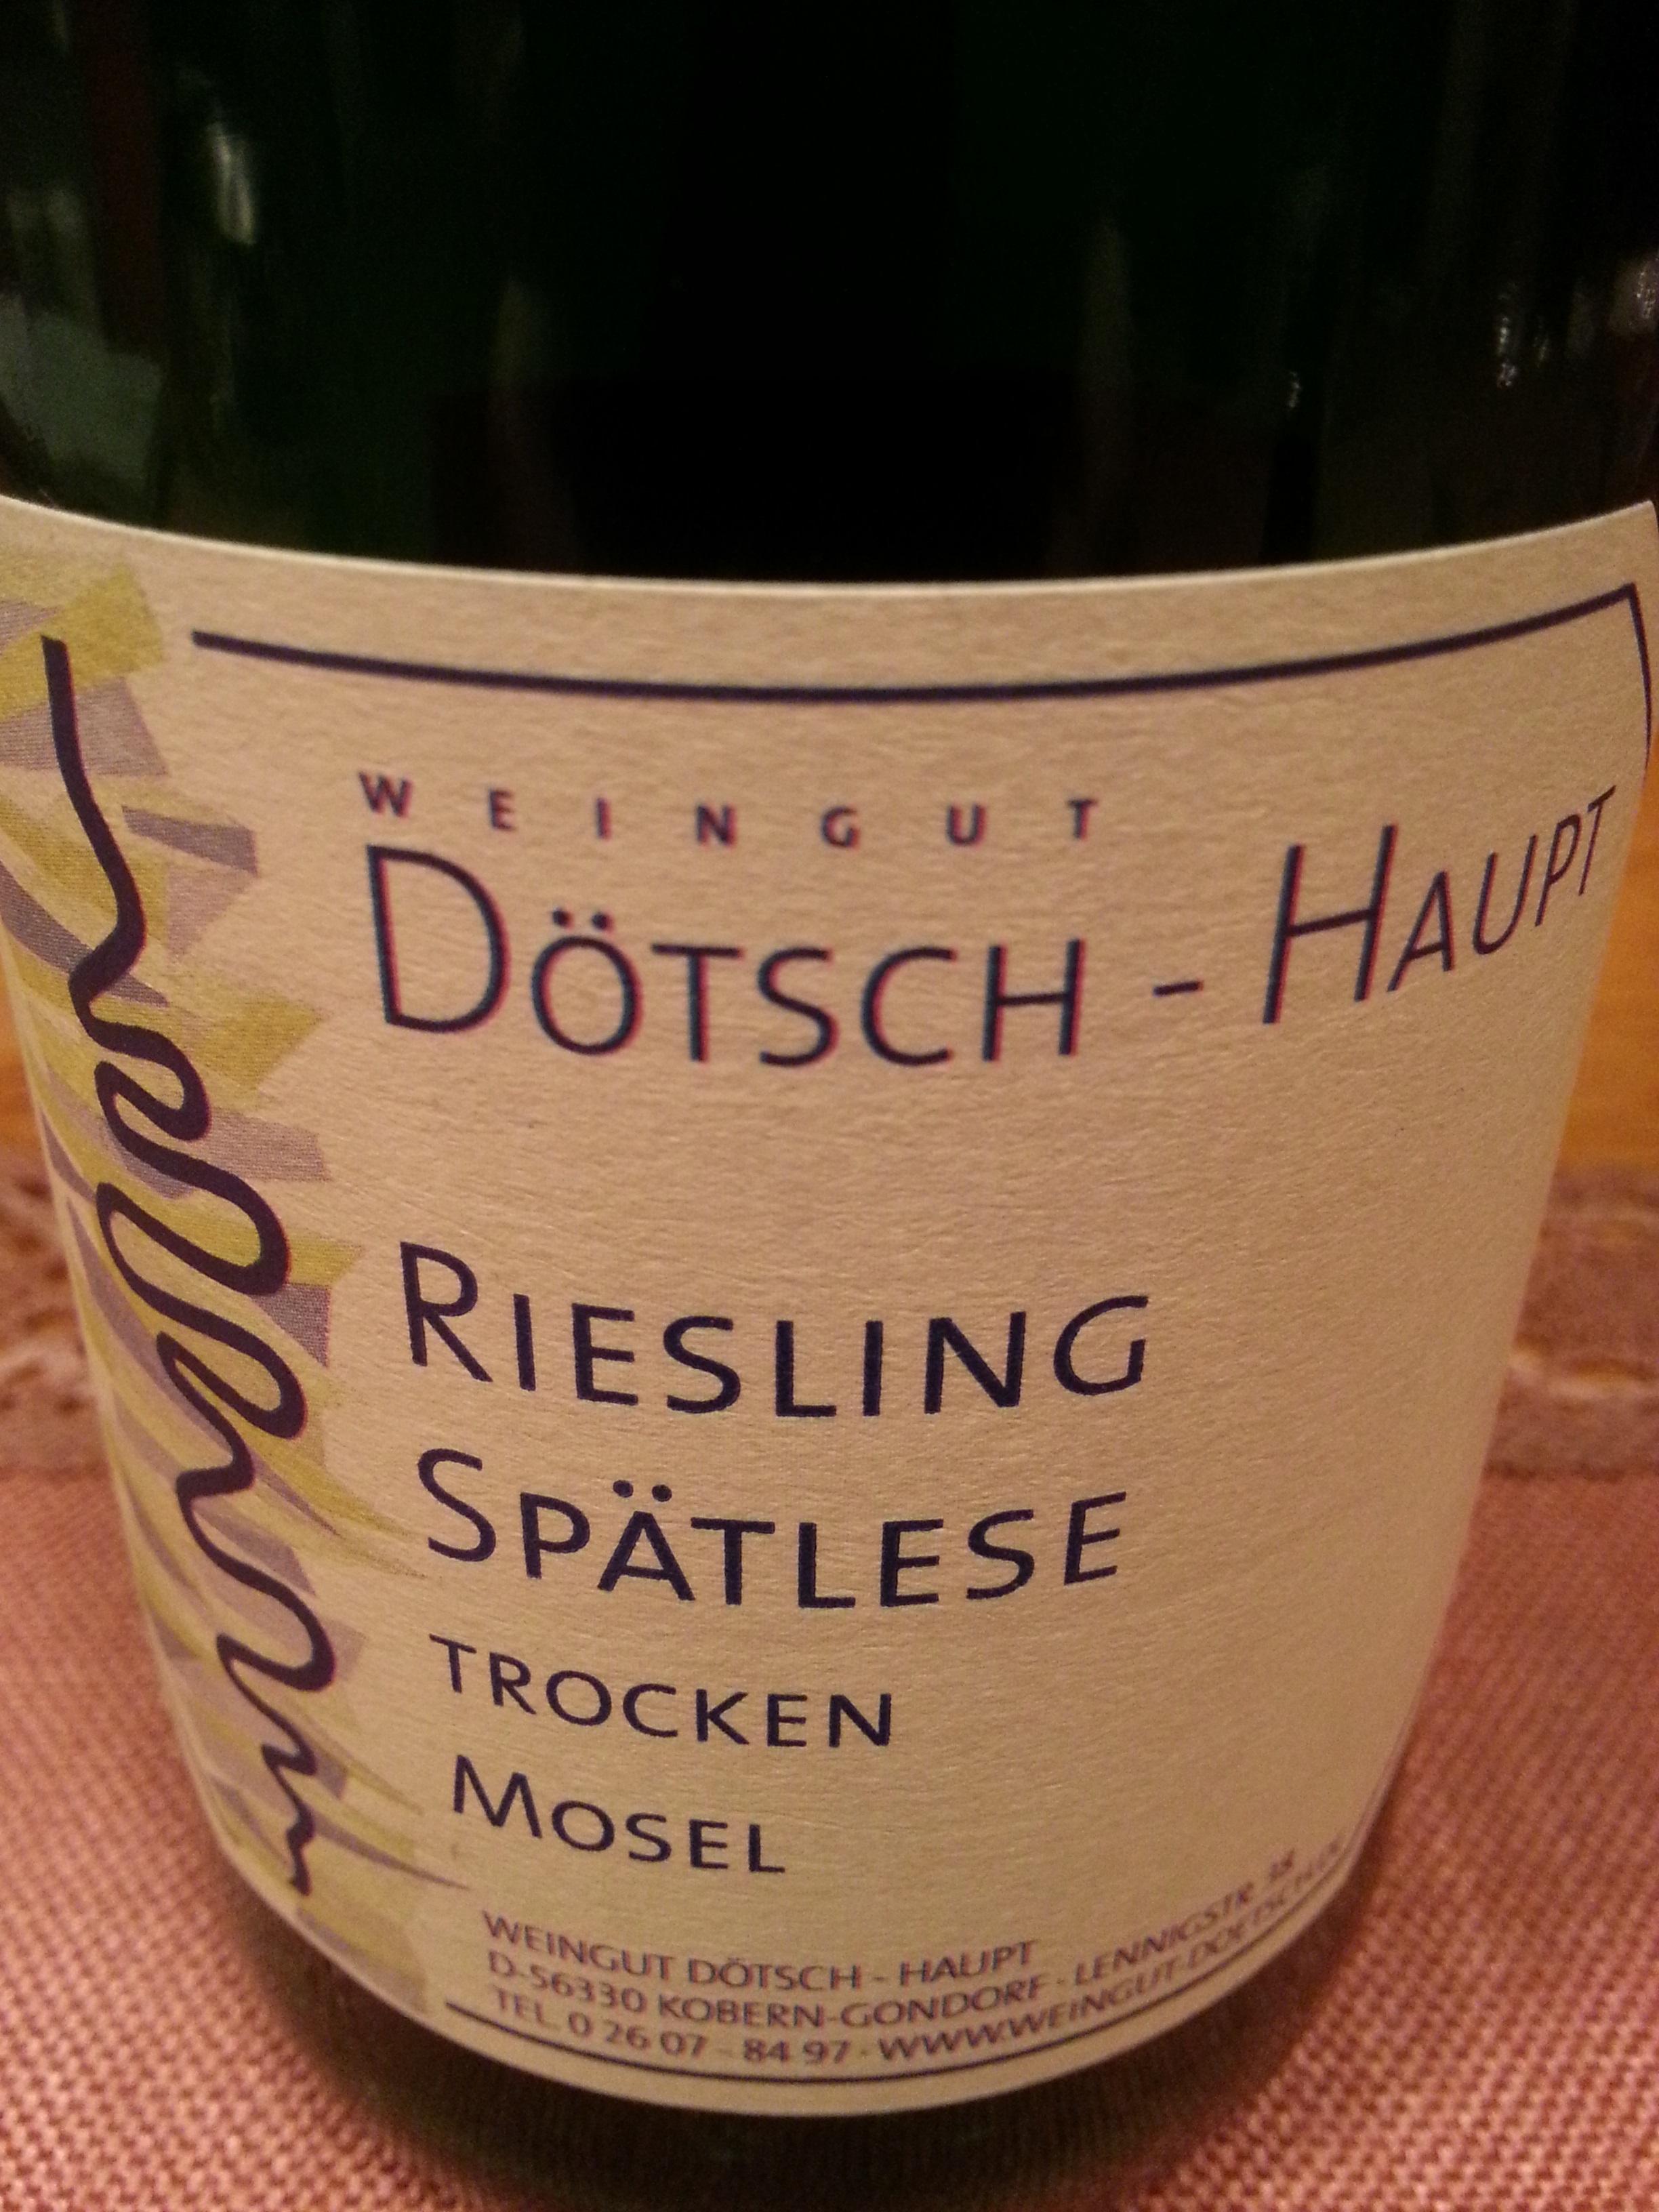 2008 Riesling Spätlese trocken Koberner Uhlen | Dötsch-Haupt